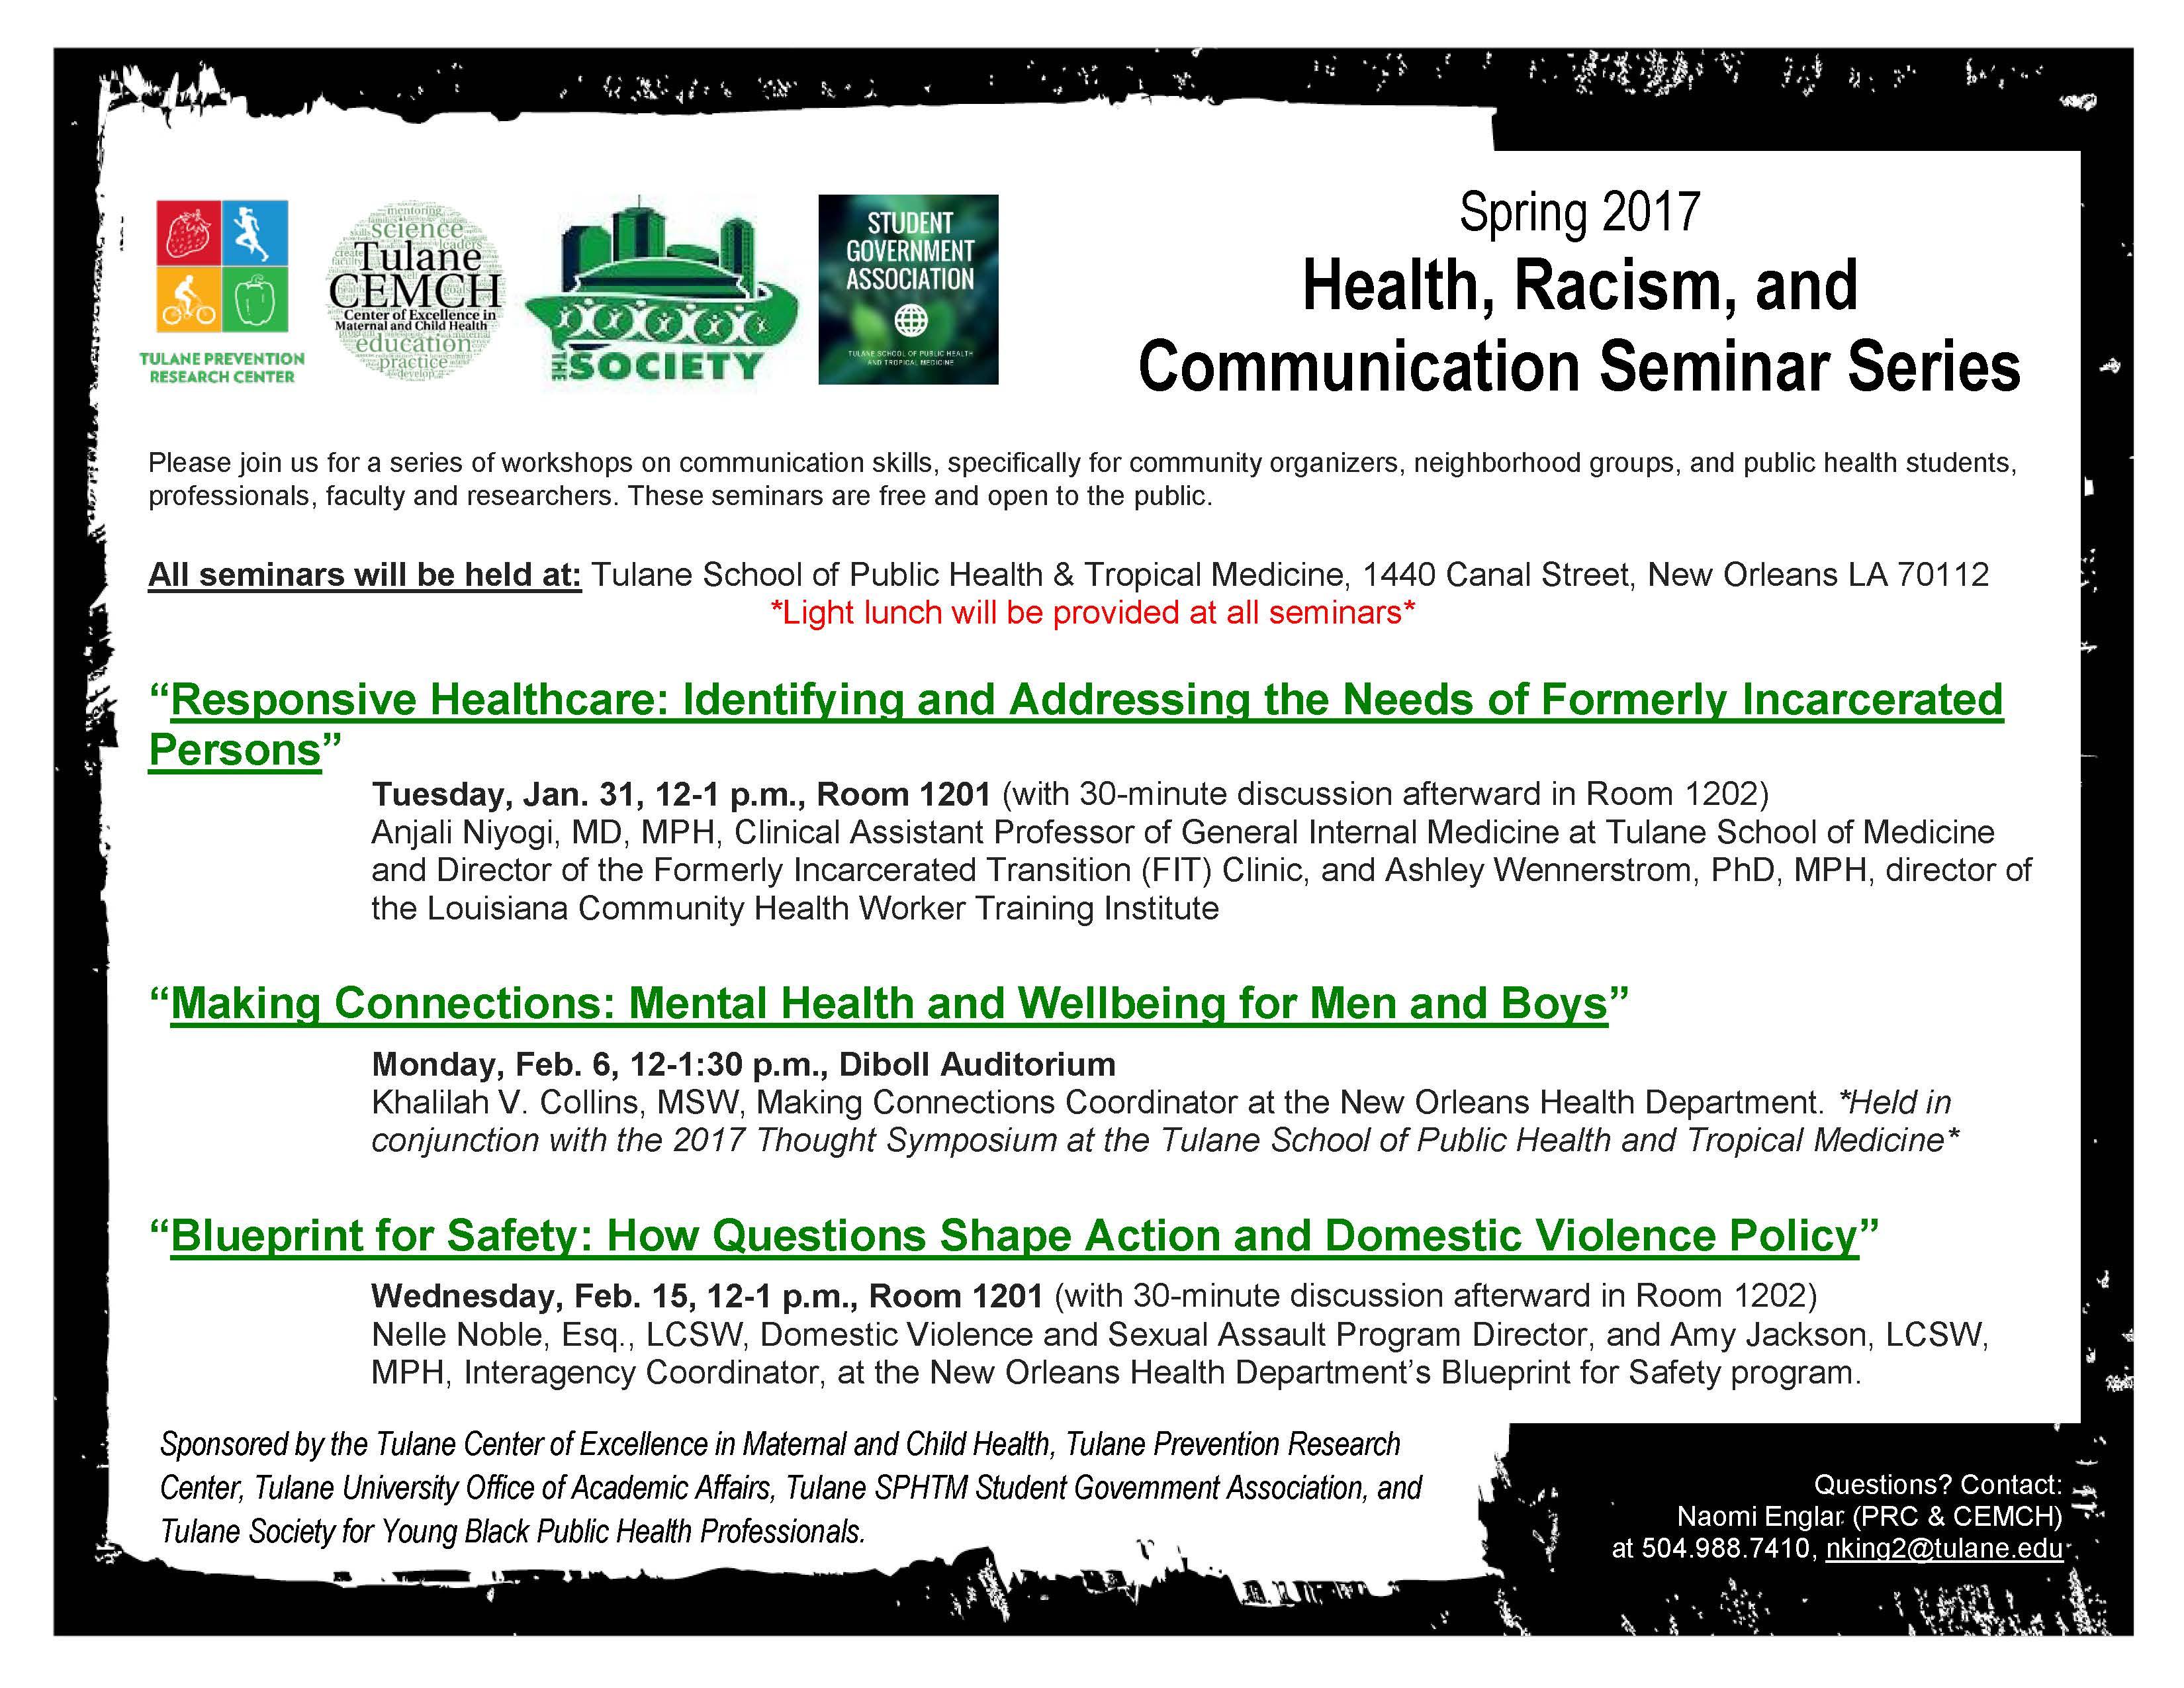 Spring 2017 health racism and communication seminar series spring 2017 health racism and communication seminar series malvernweather Choice Image